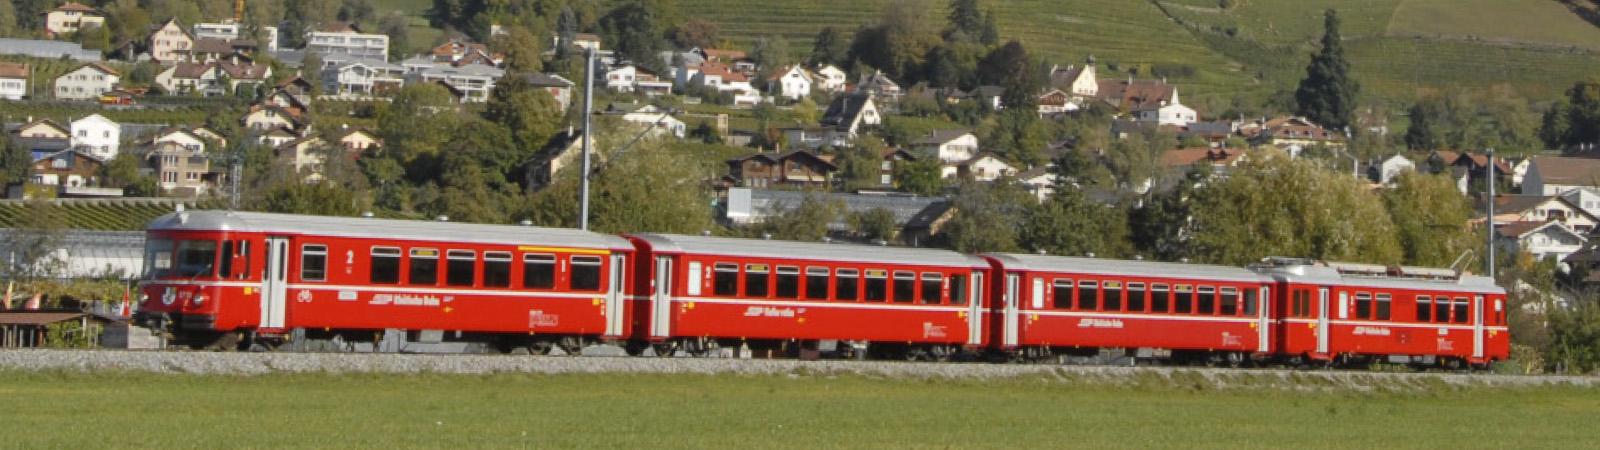 #7243 156  RhB Be 4/4 516/ABDt 1711 Shuttle train (2021年秋発売予定)